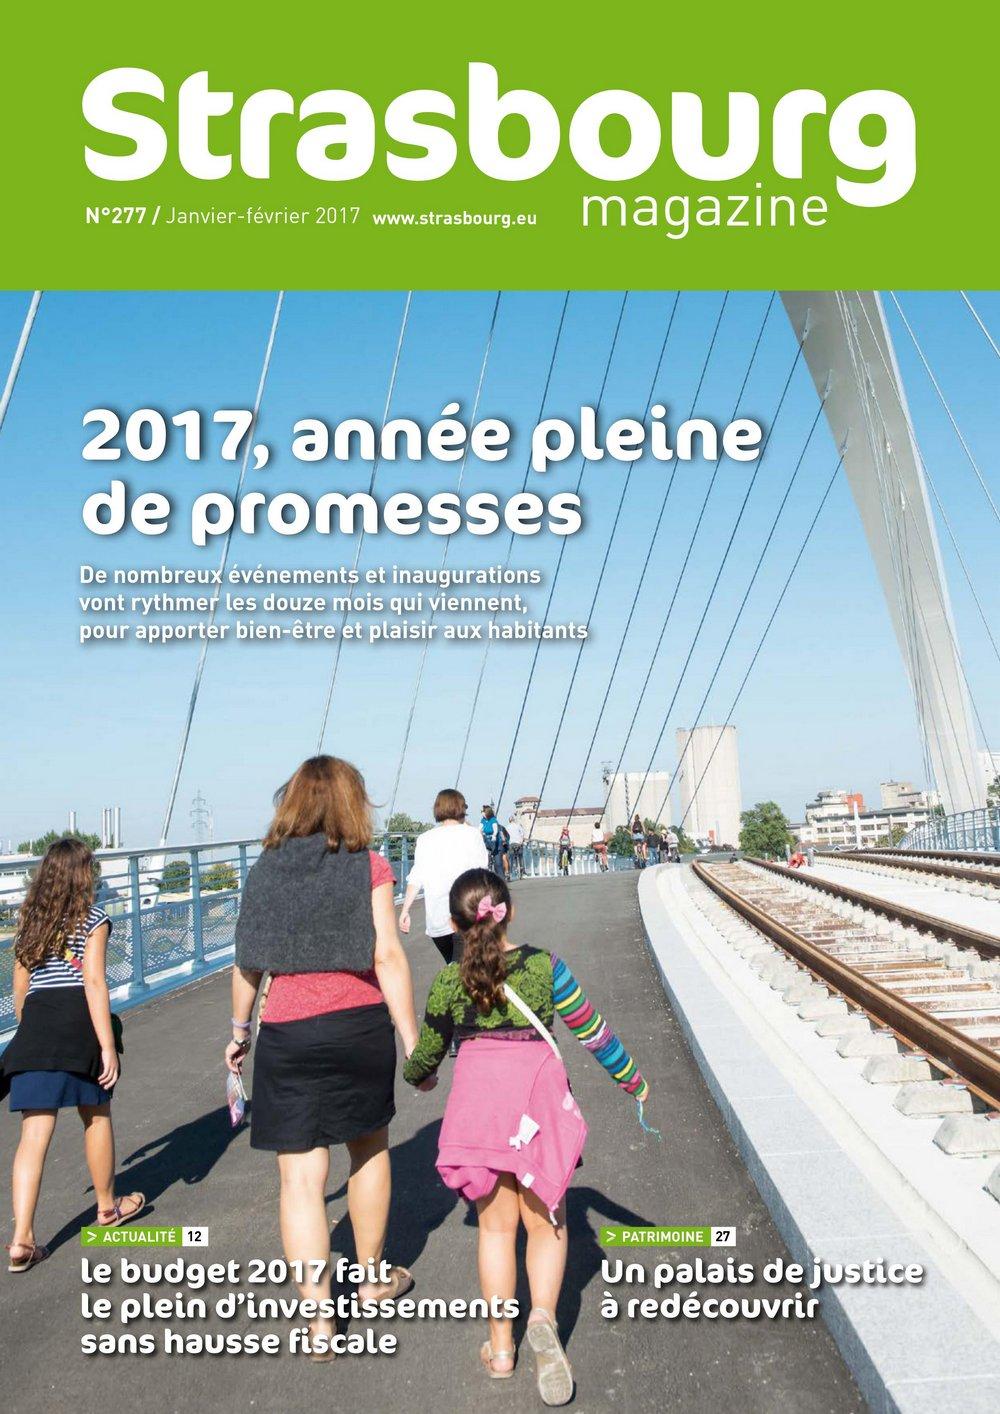 Strasbourg Magazine – Une œuvre utopiste et fédératrice